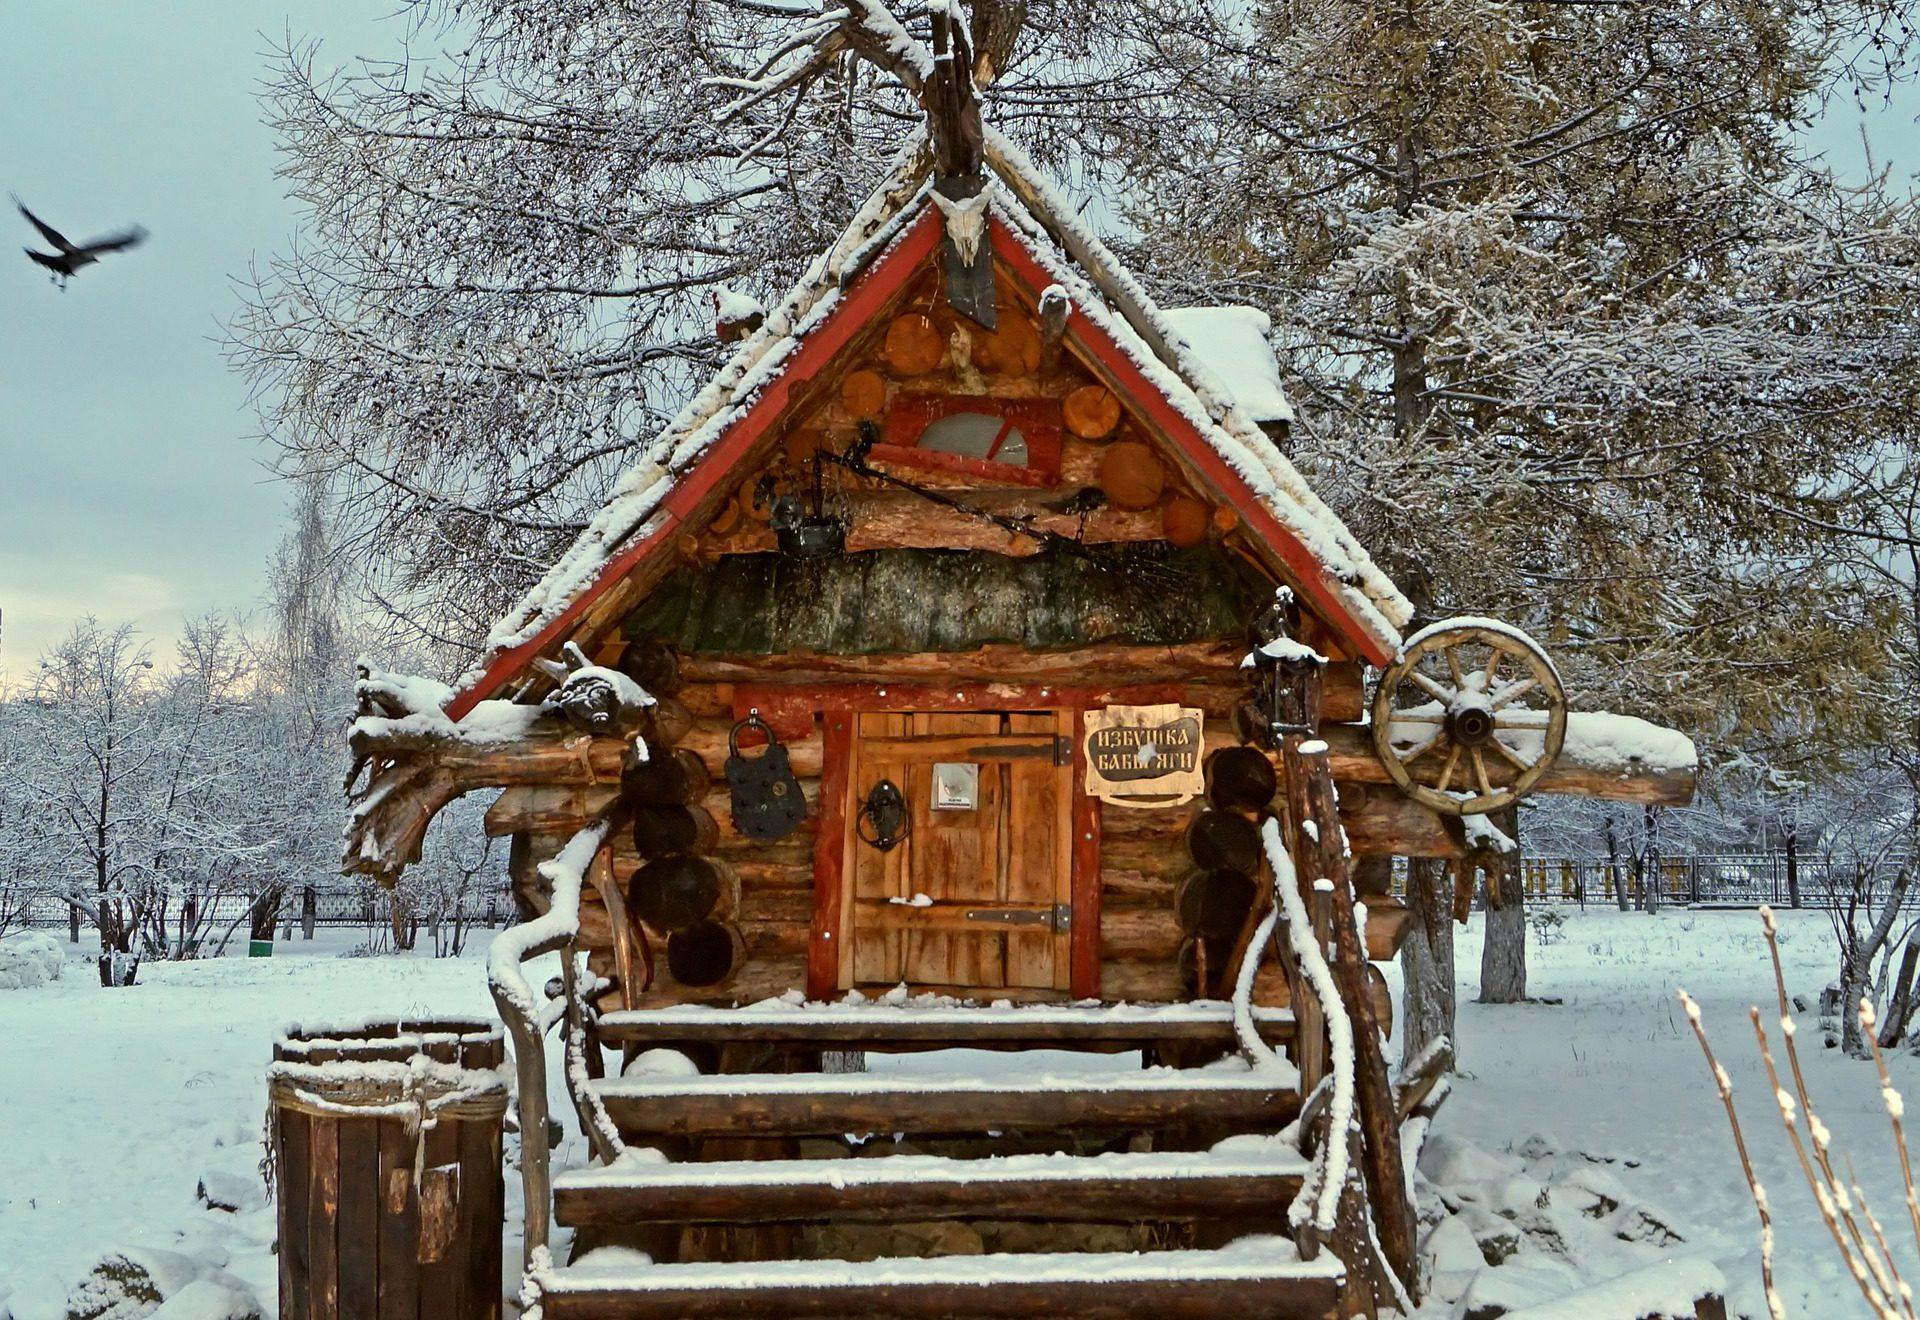 Teremok - Baba Yaga - Russian folklore poem